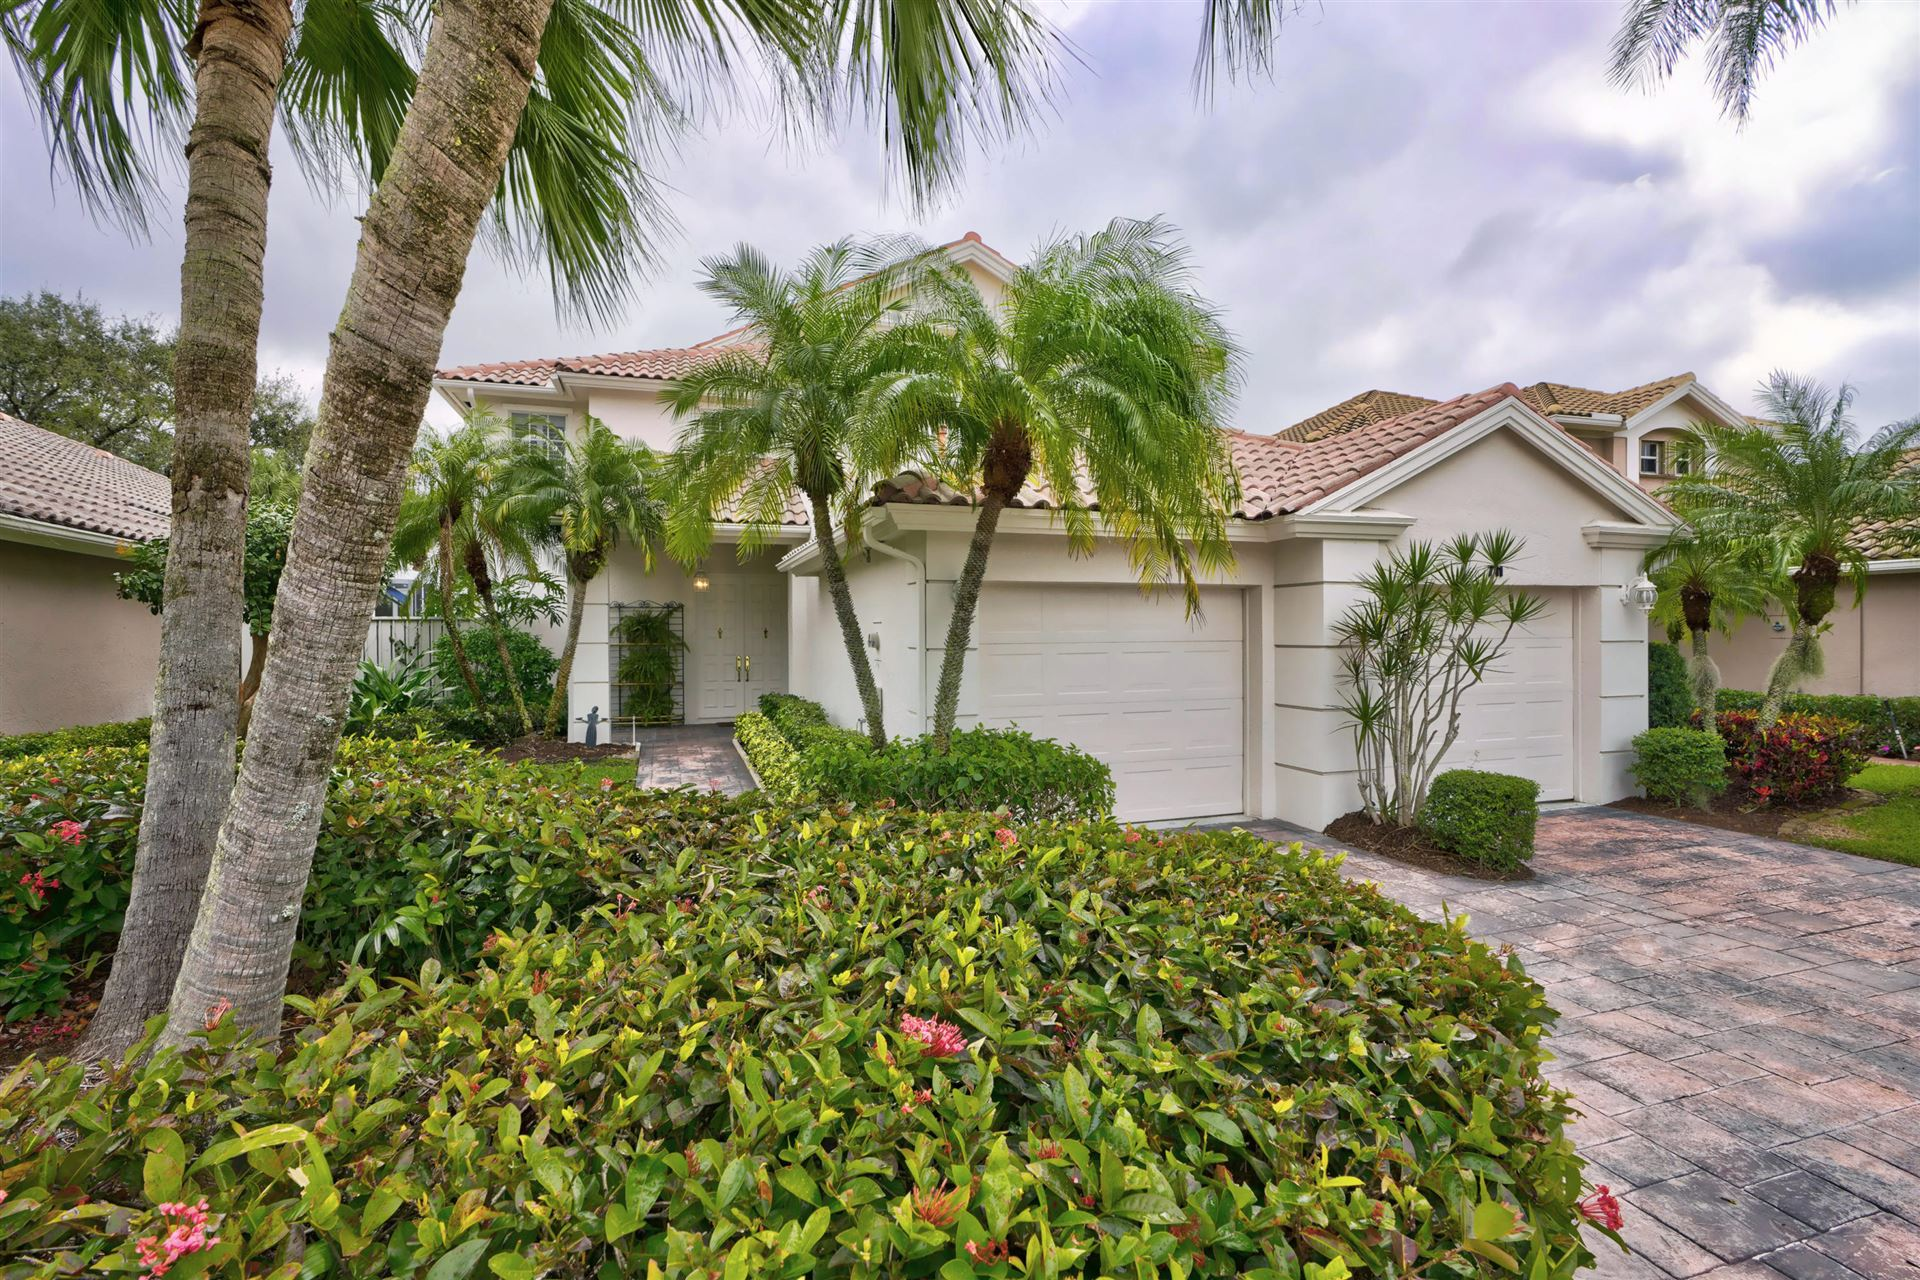 Photo of 711 Pinehurst Way, Palm Beach Gardens, FL 33418 (MLS # RX-10597362)